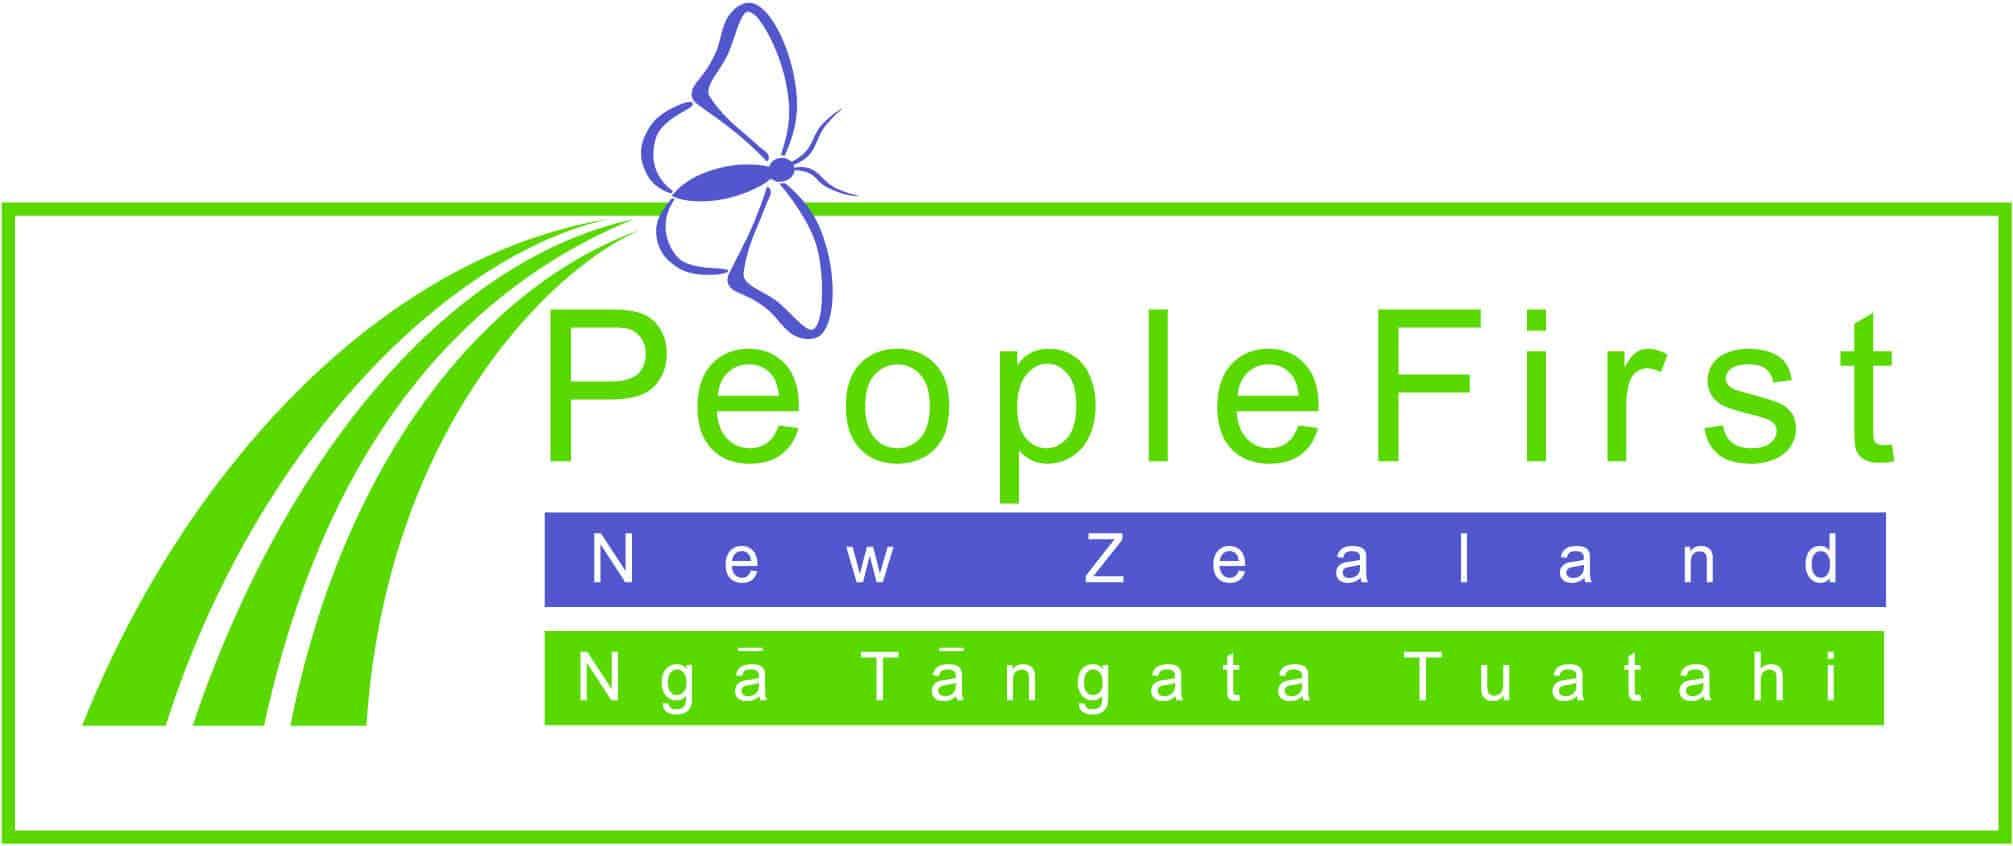 People First New Zealand Ngā Tāngata Tuatahi